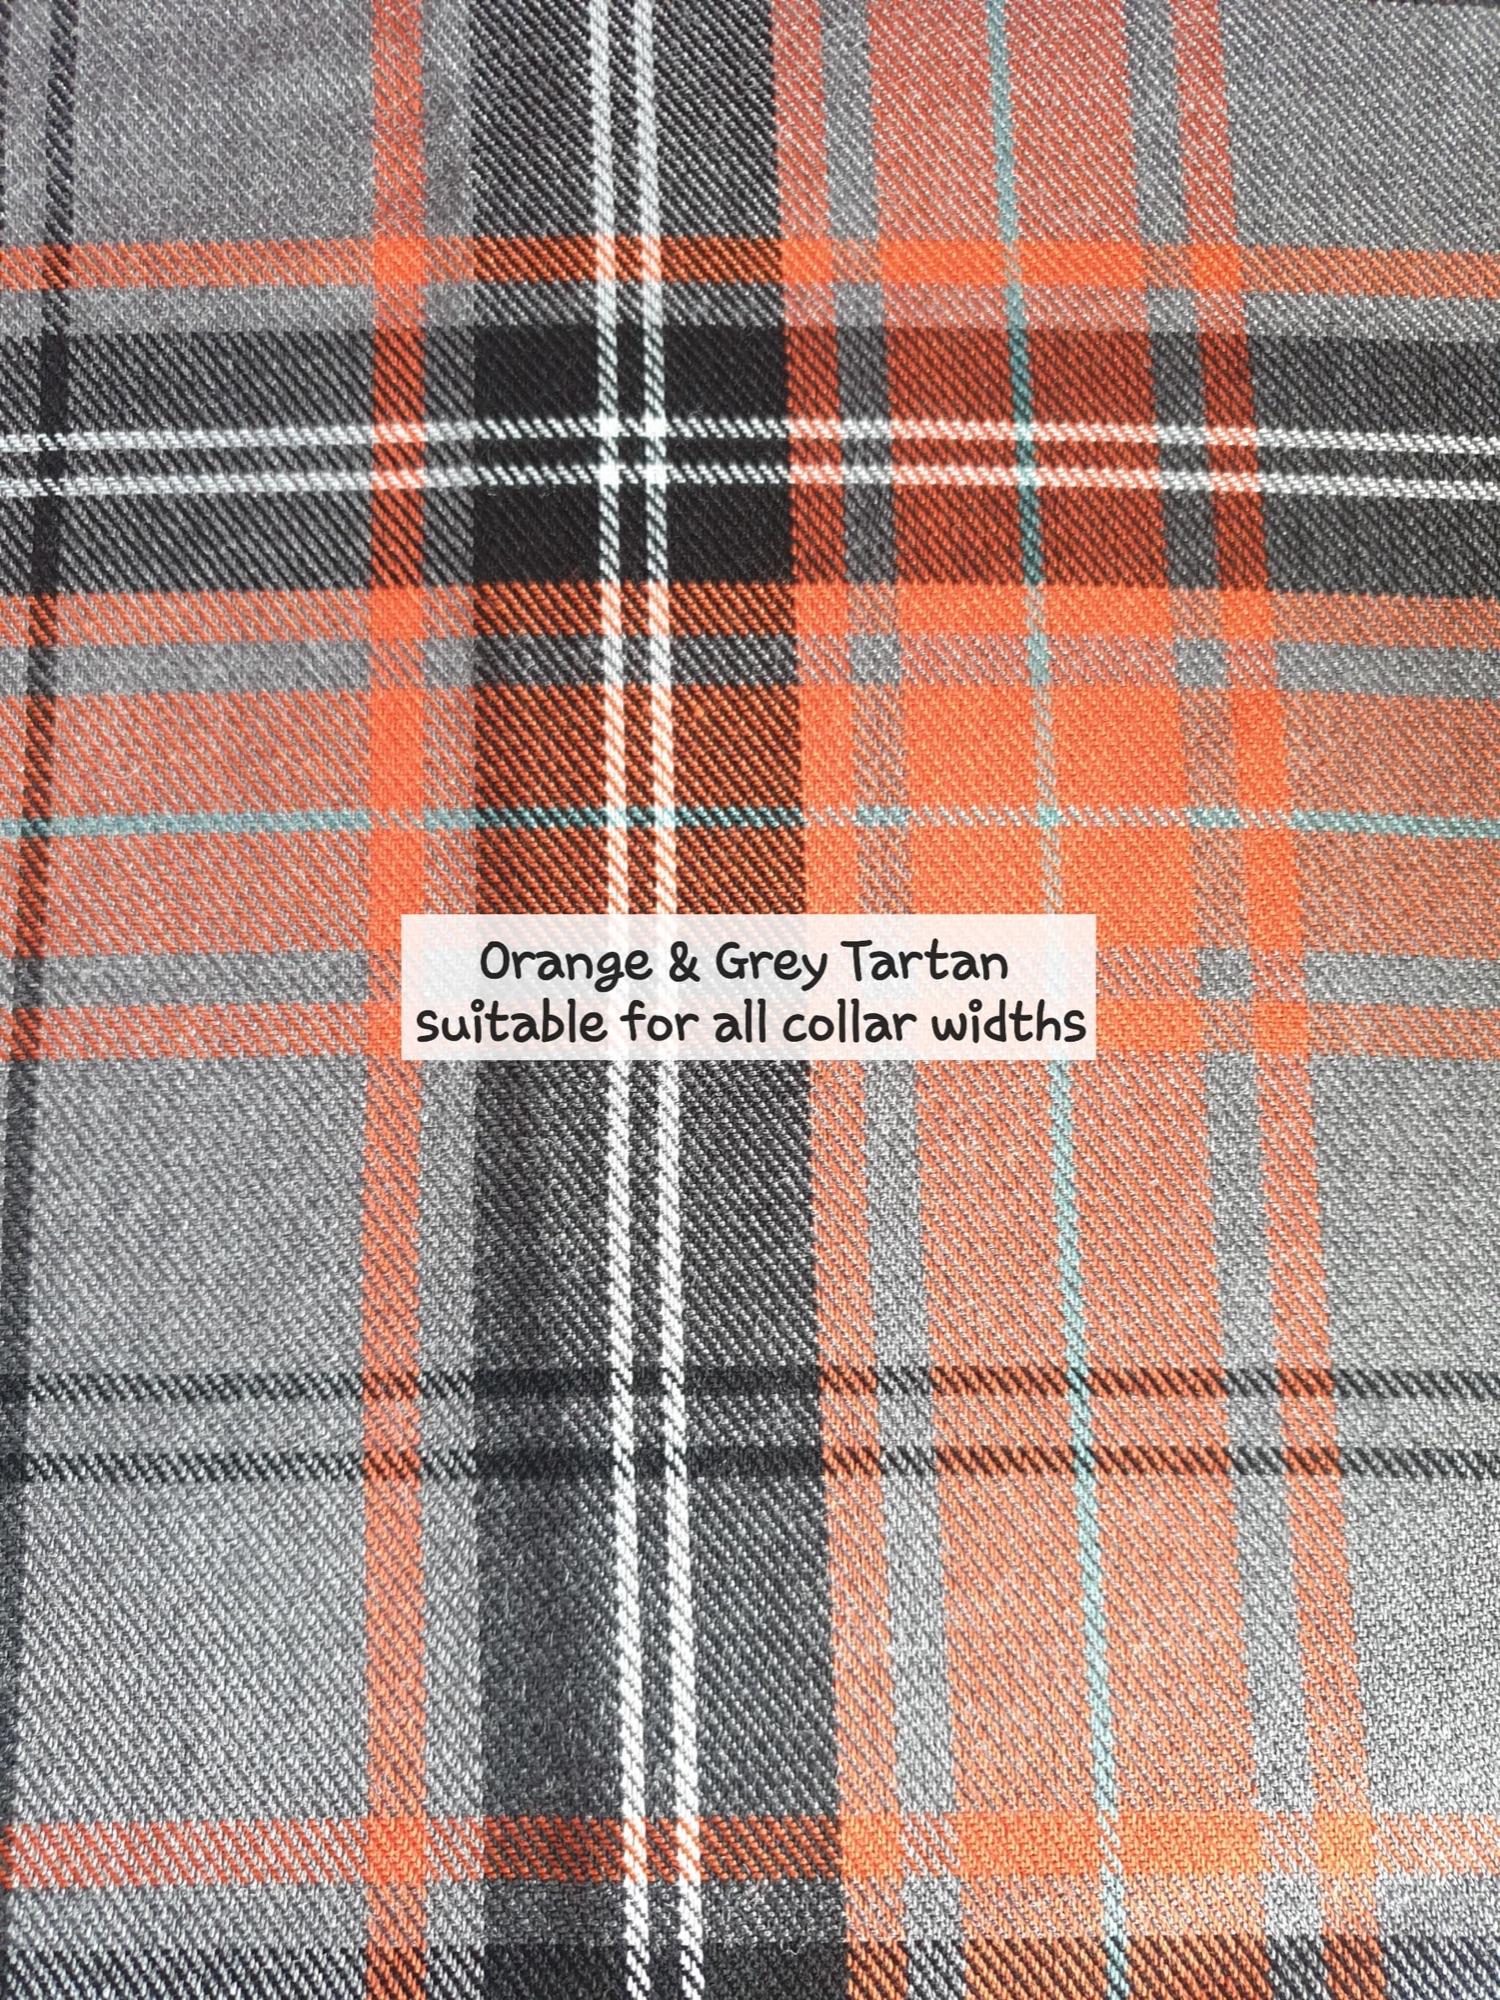 orange and grey tartan